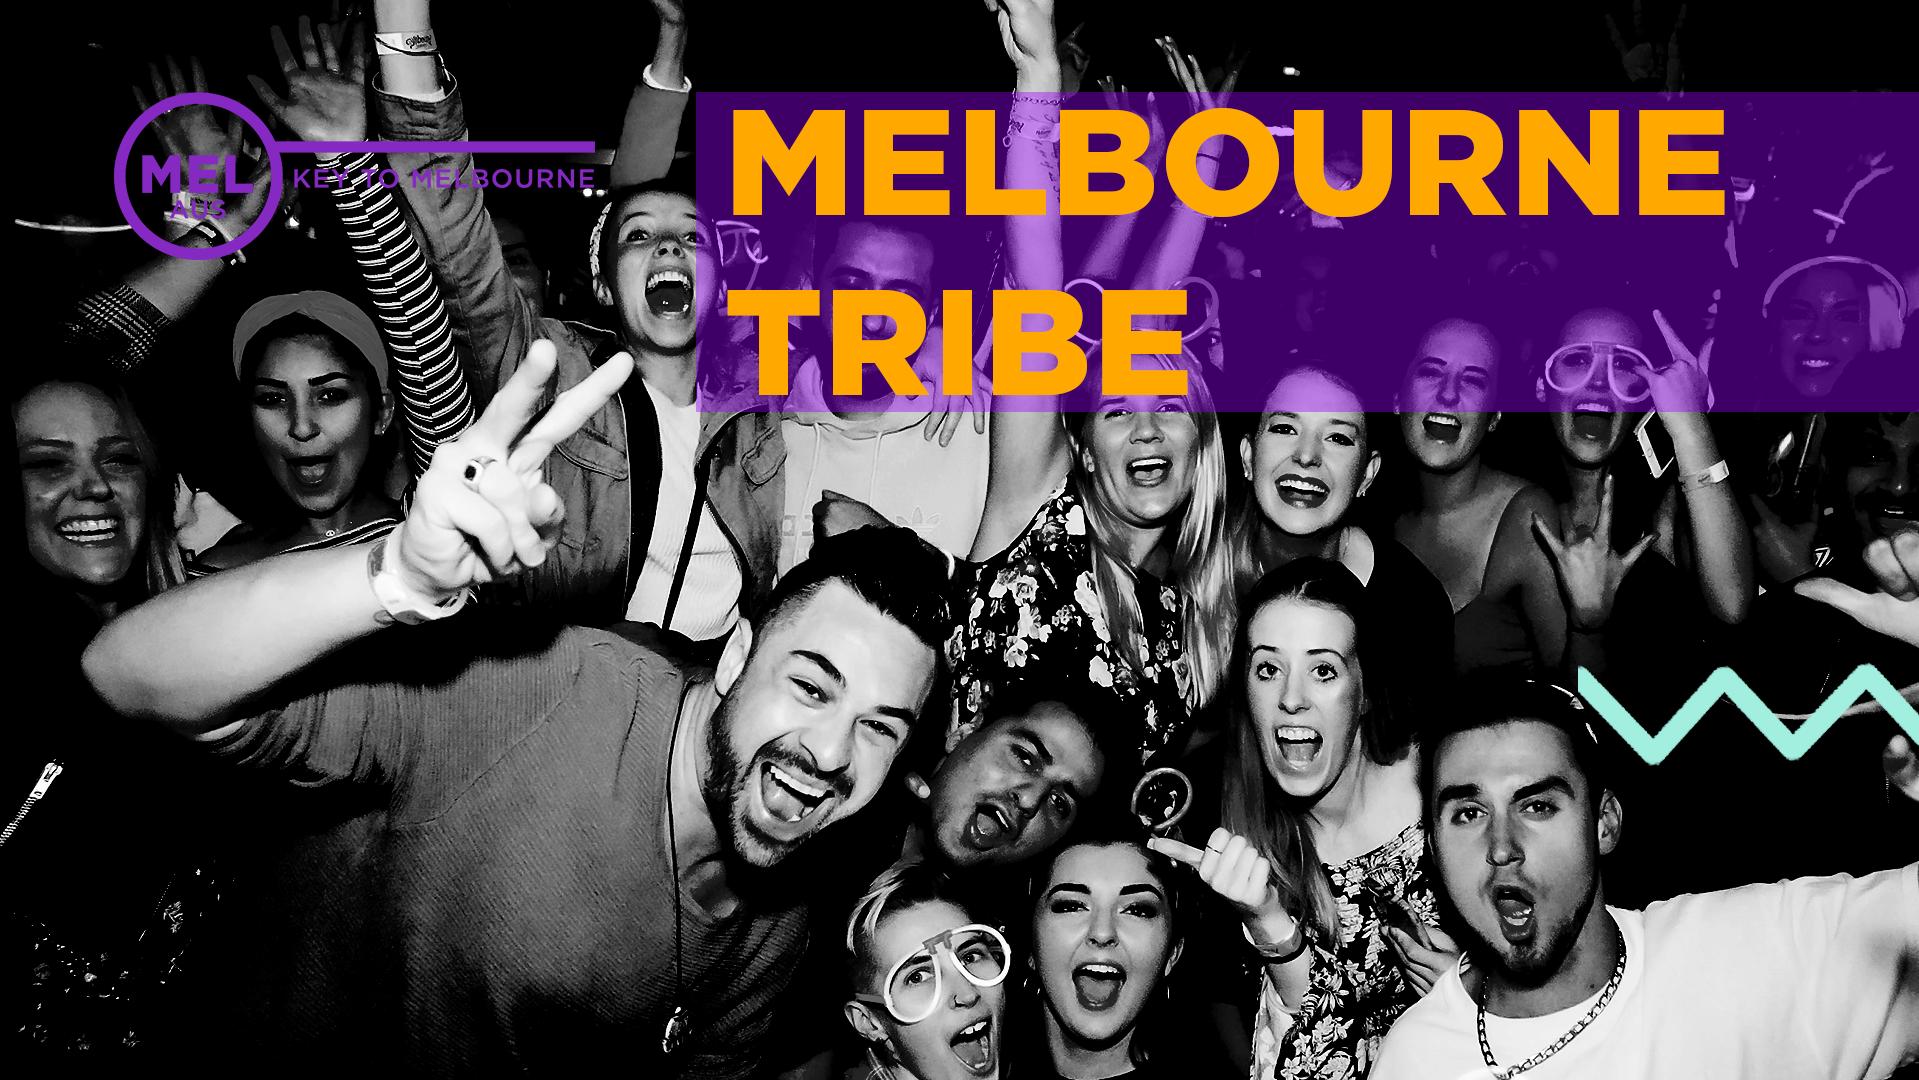 Melbourne Tribe